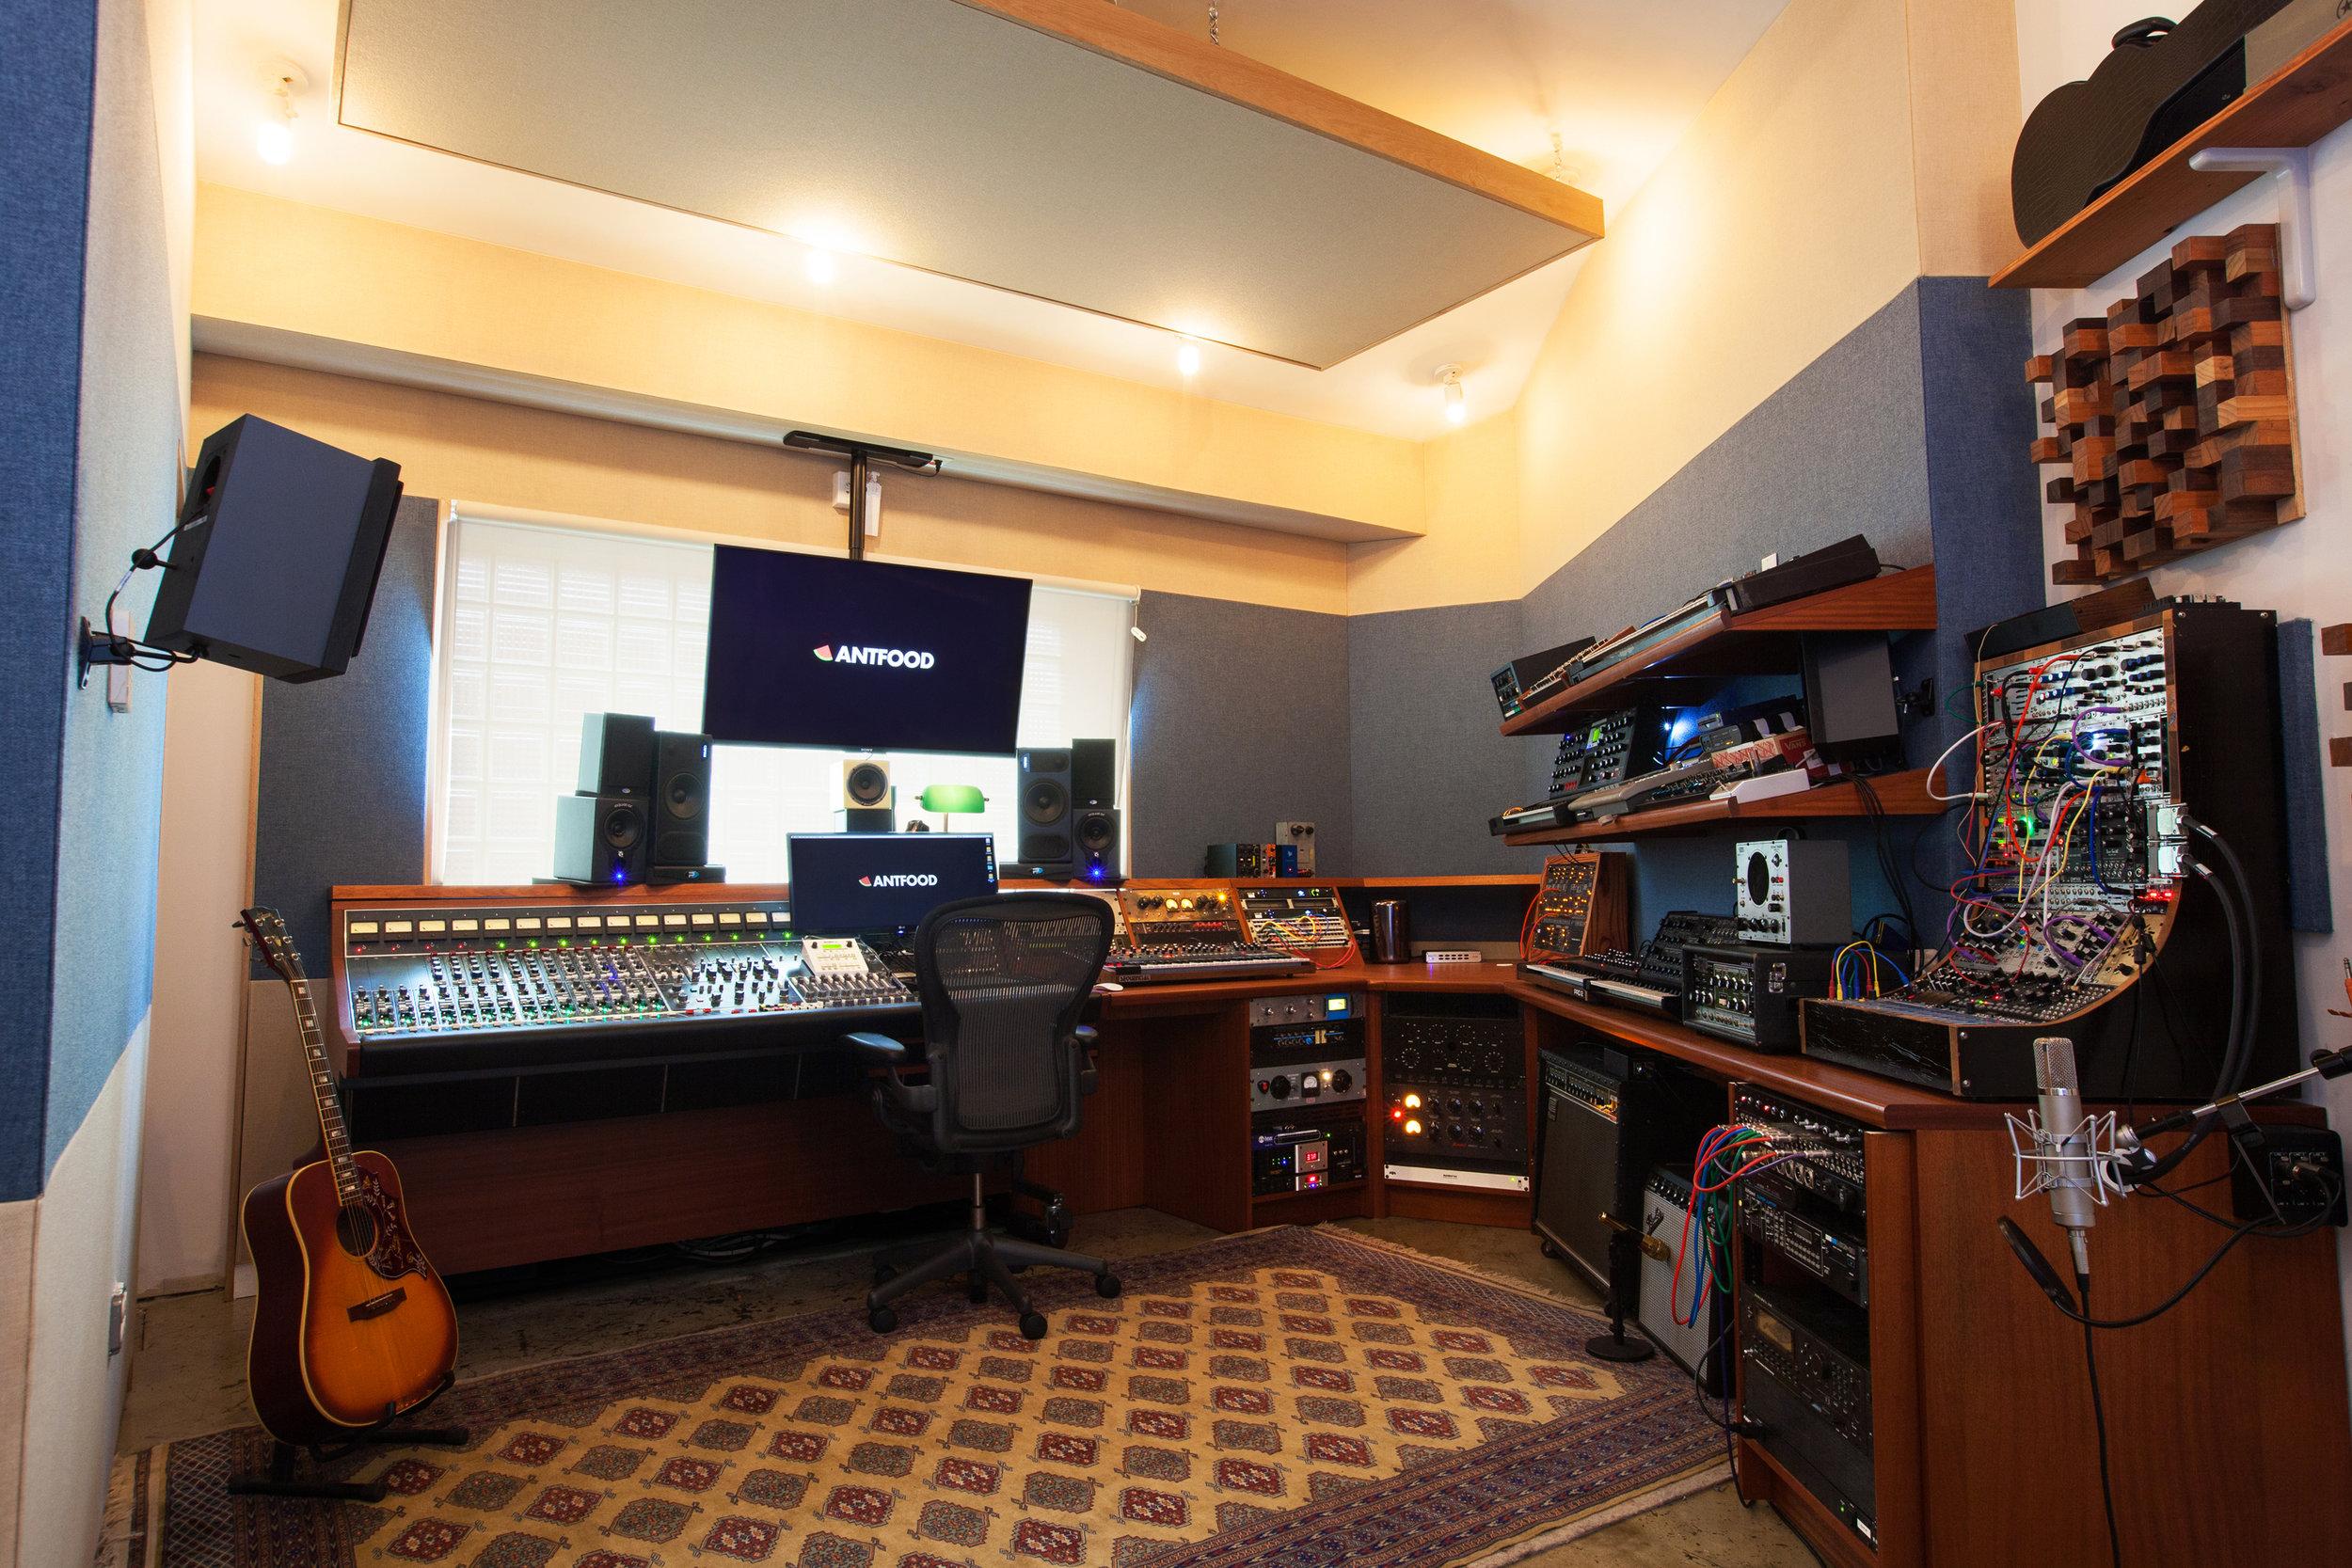 Antfood recording studio2.jpg